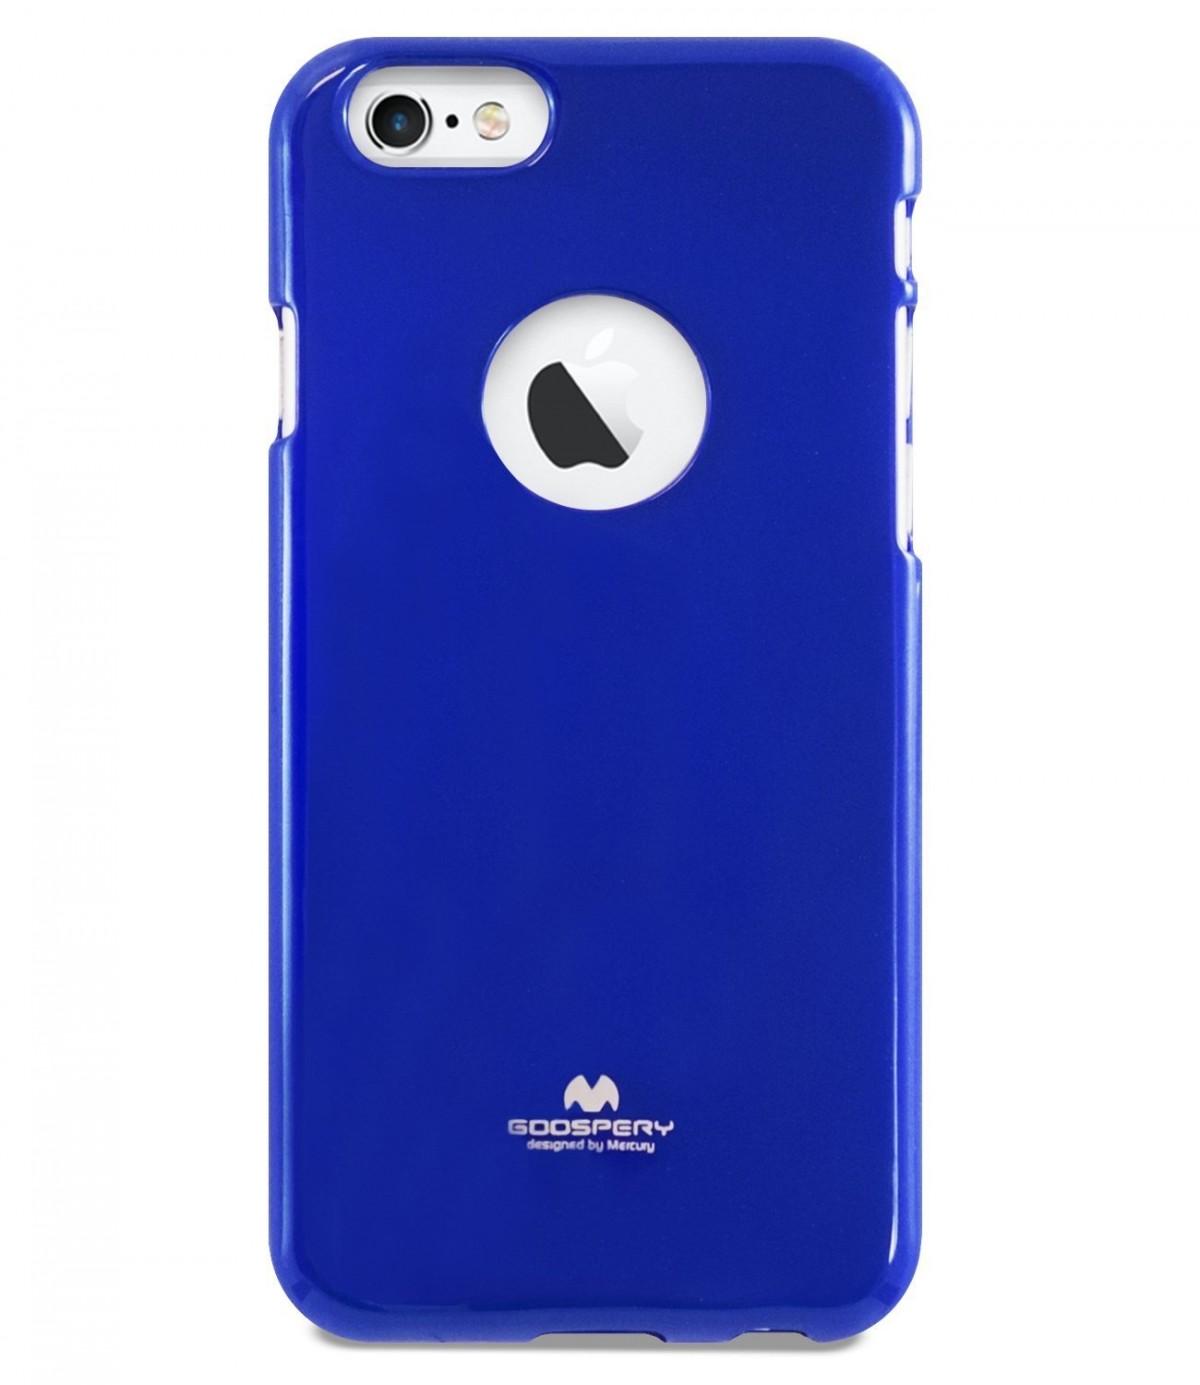 Tenké silikonové obaly / kryty Goospery Mercury pro Apple iPhone 6s/6 - Modrý / Blue